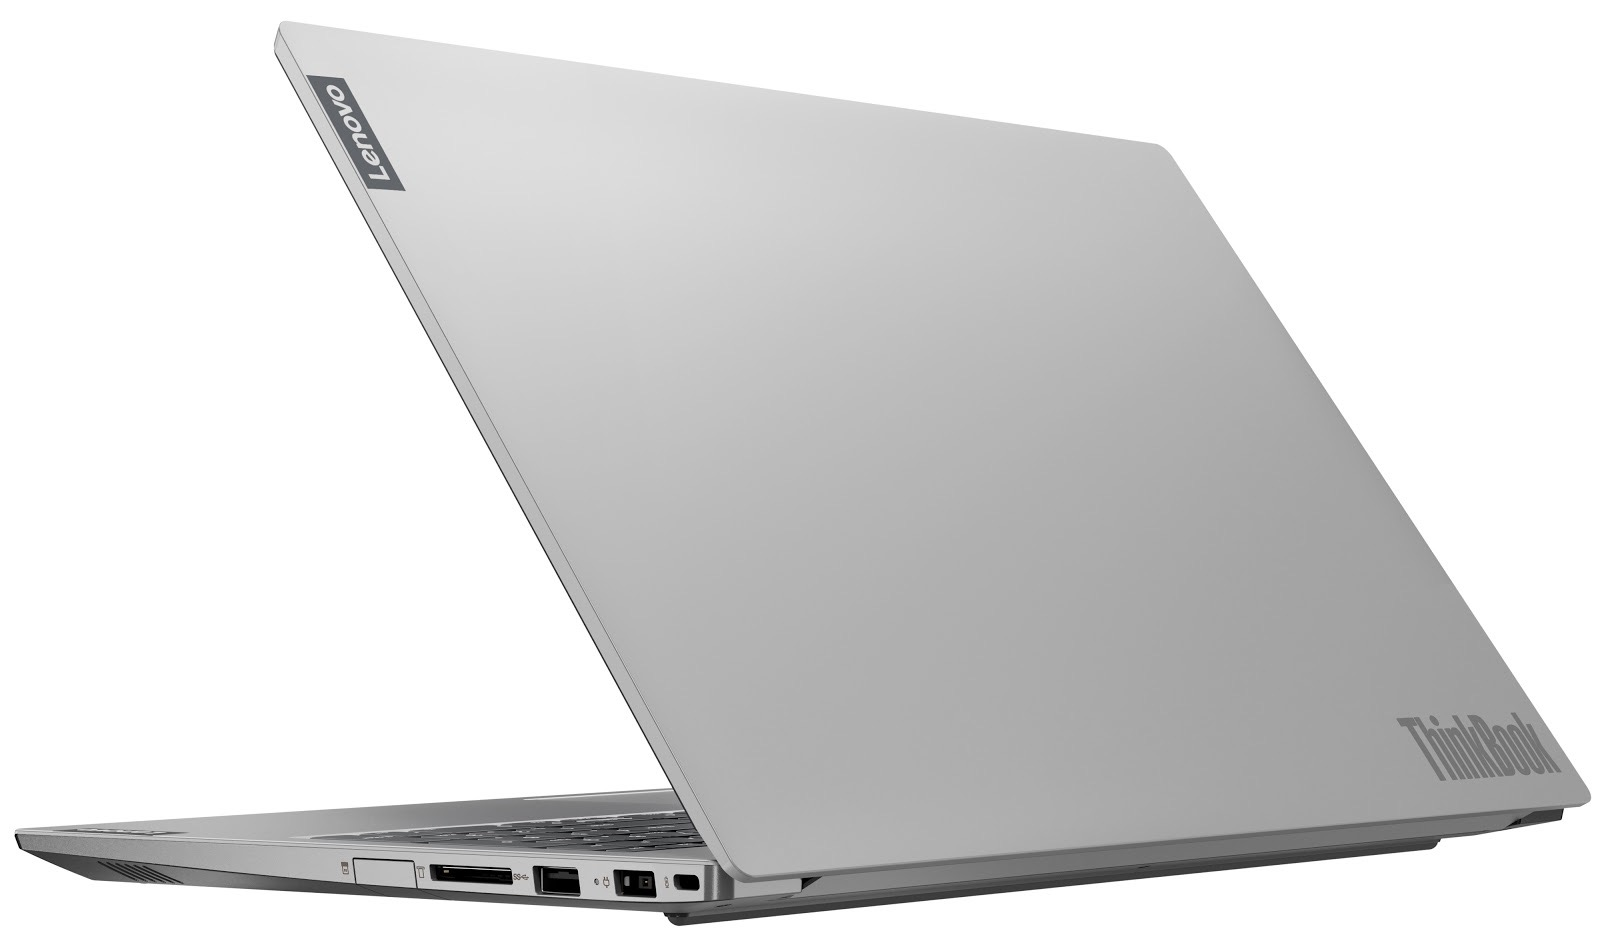 Фото 1. Ноутбук Lenovo ThinkBook 15-IIL (20SM007ERU)